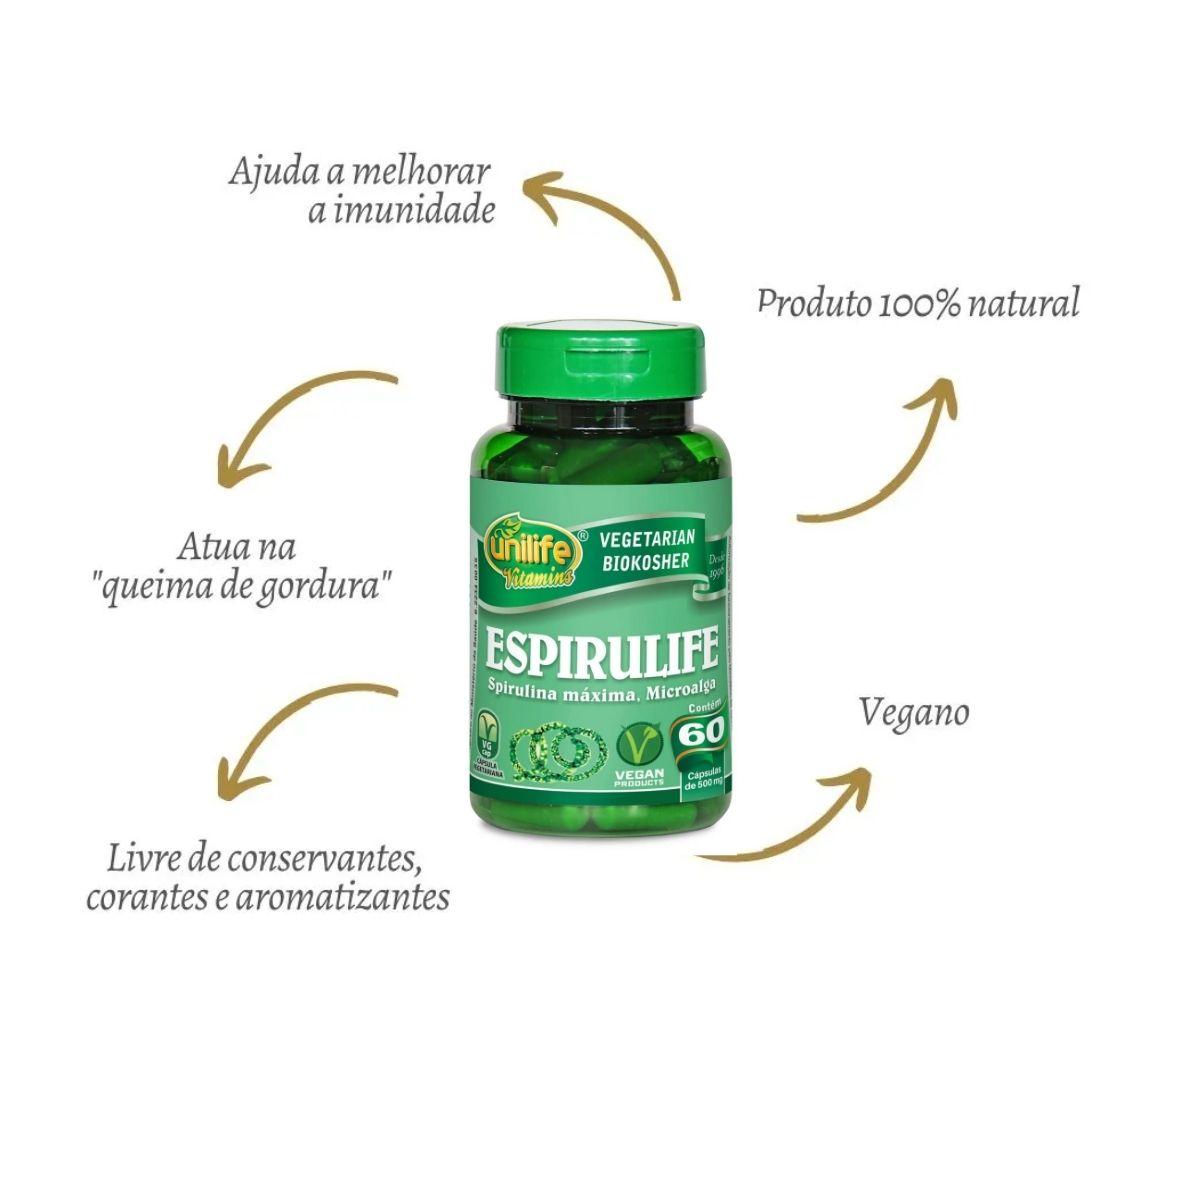 Espirulife spirulina 500mg - 60 Cápsulas - unilife